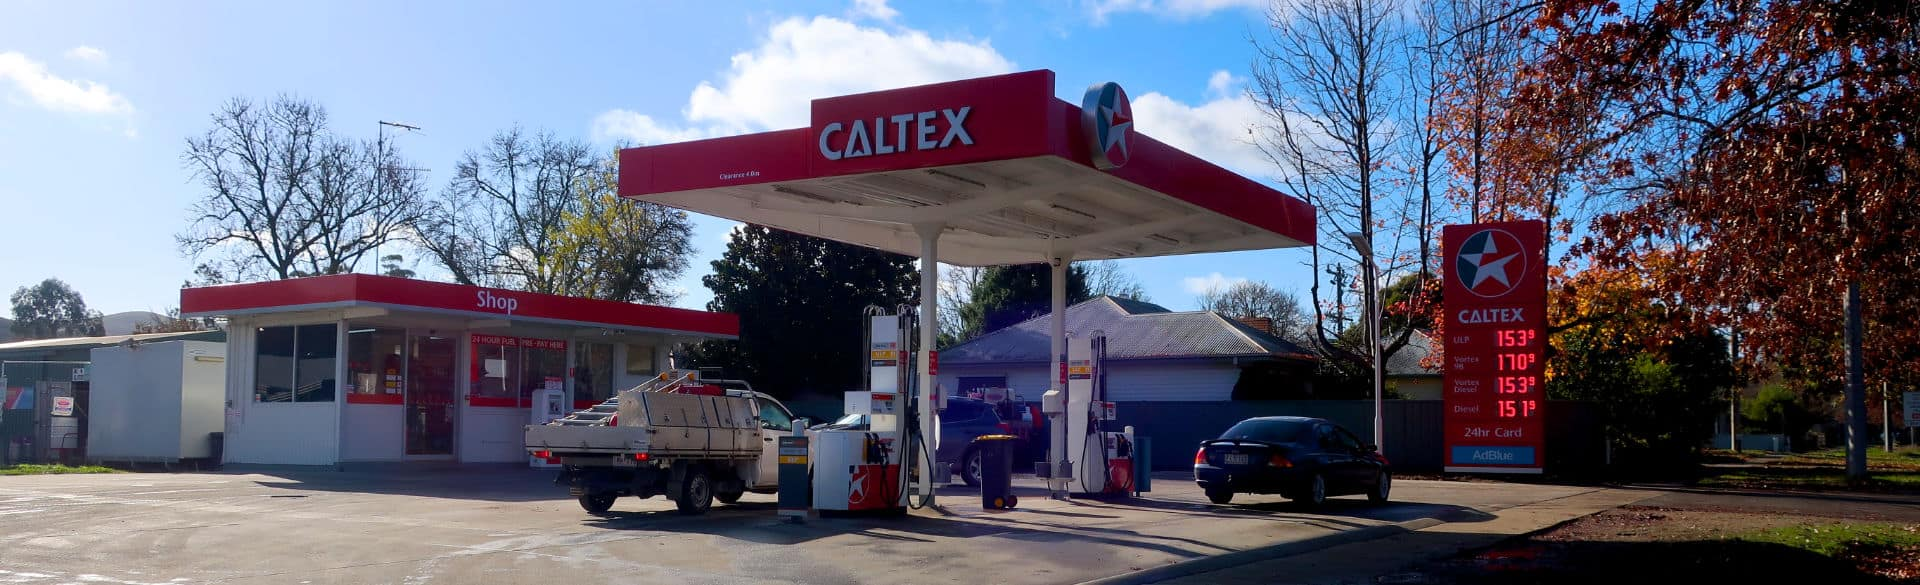 Simpsons Fuel | Caltex Alexandra | 25 Aitken St, Alexandra